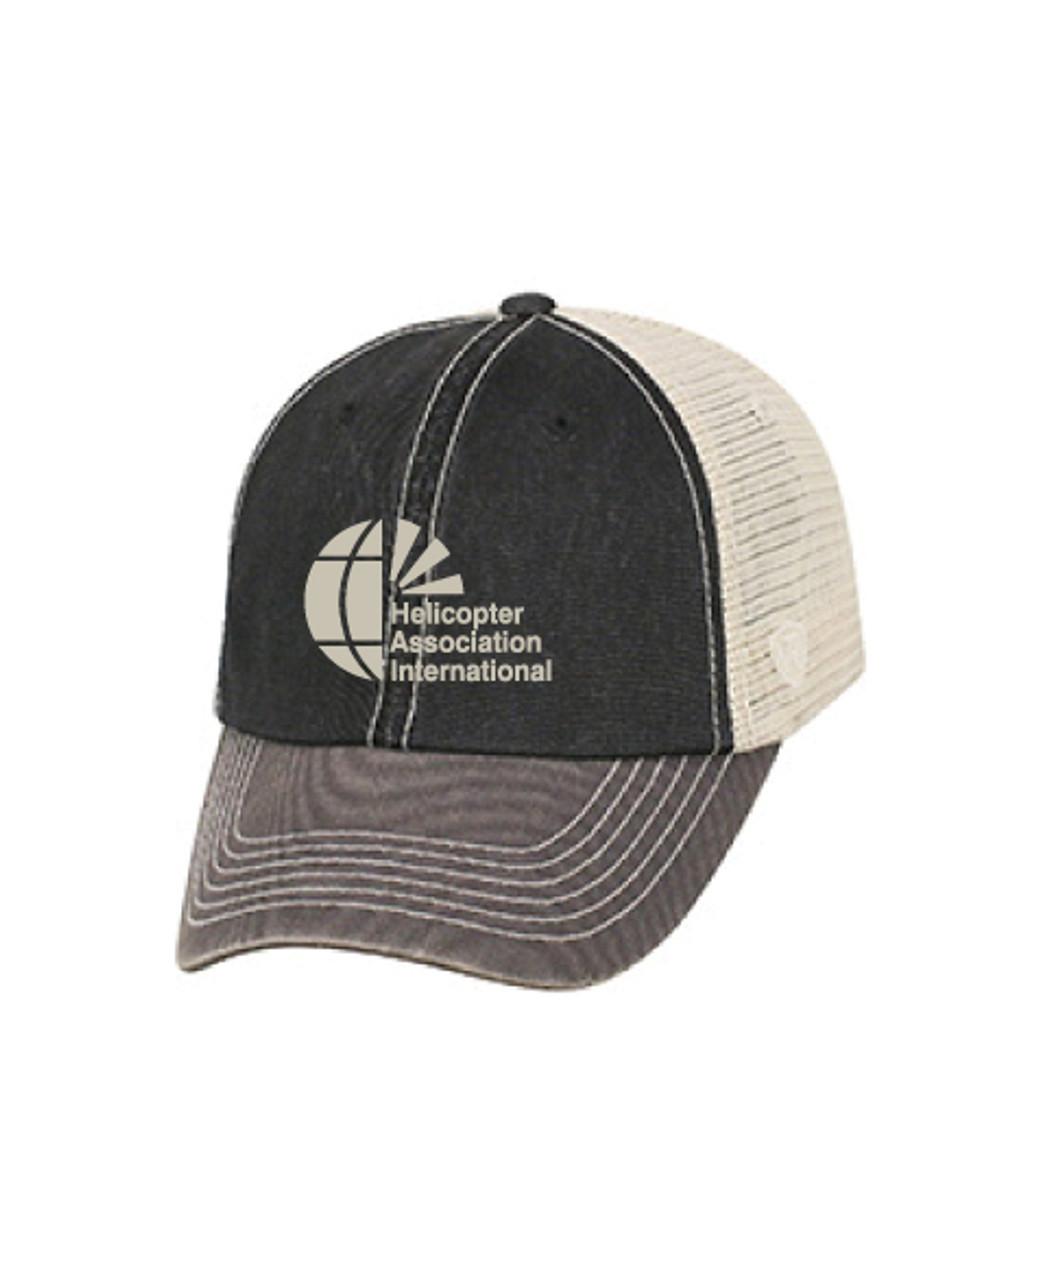 Vintage Washed Offroad Mesh Trucker Hat